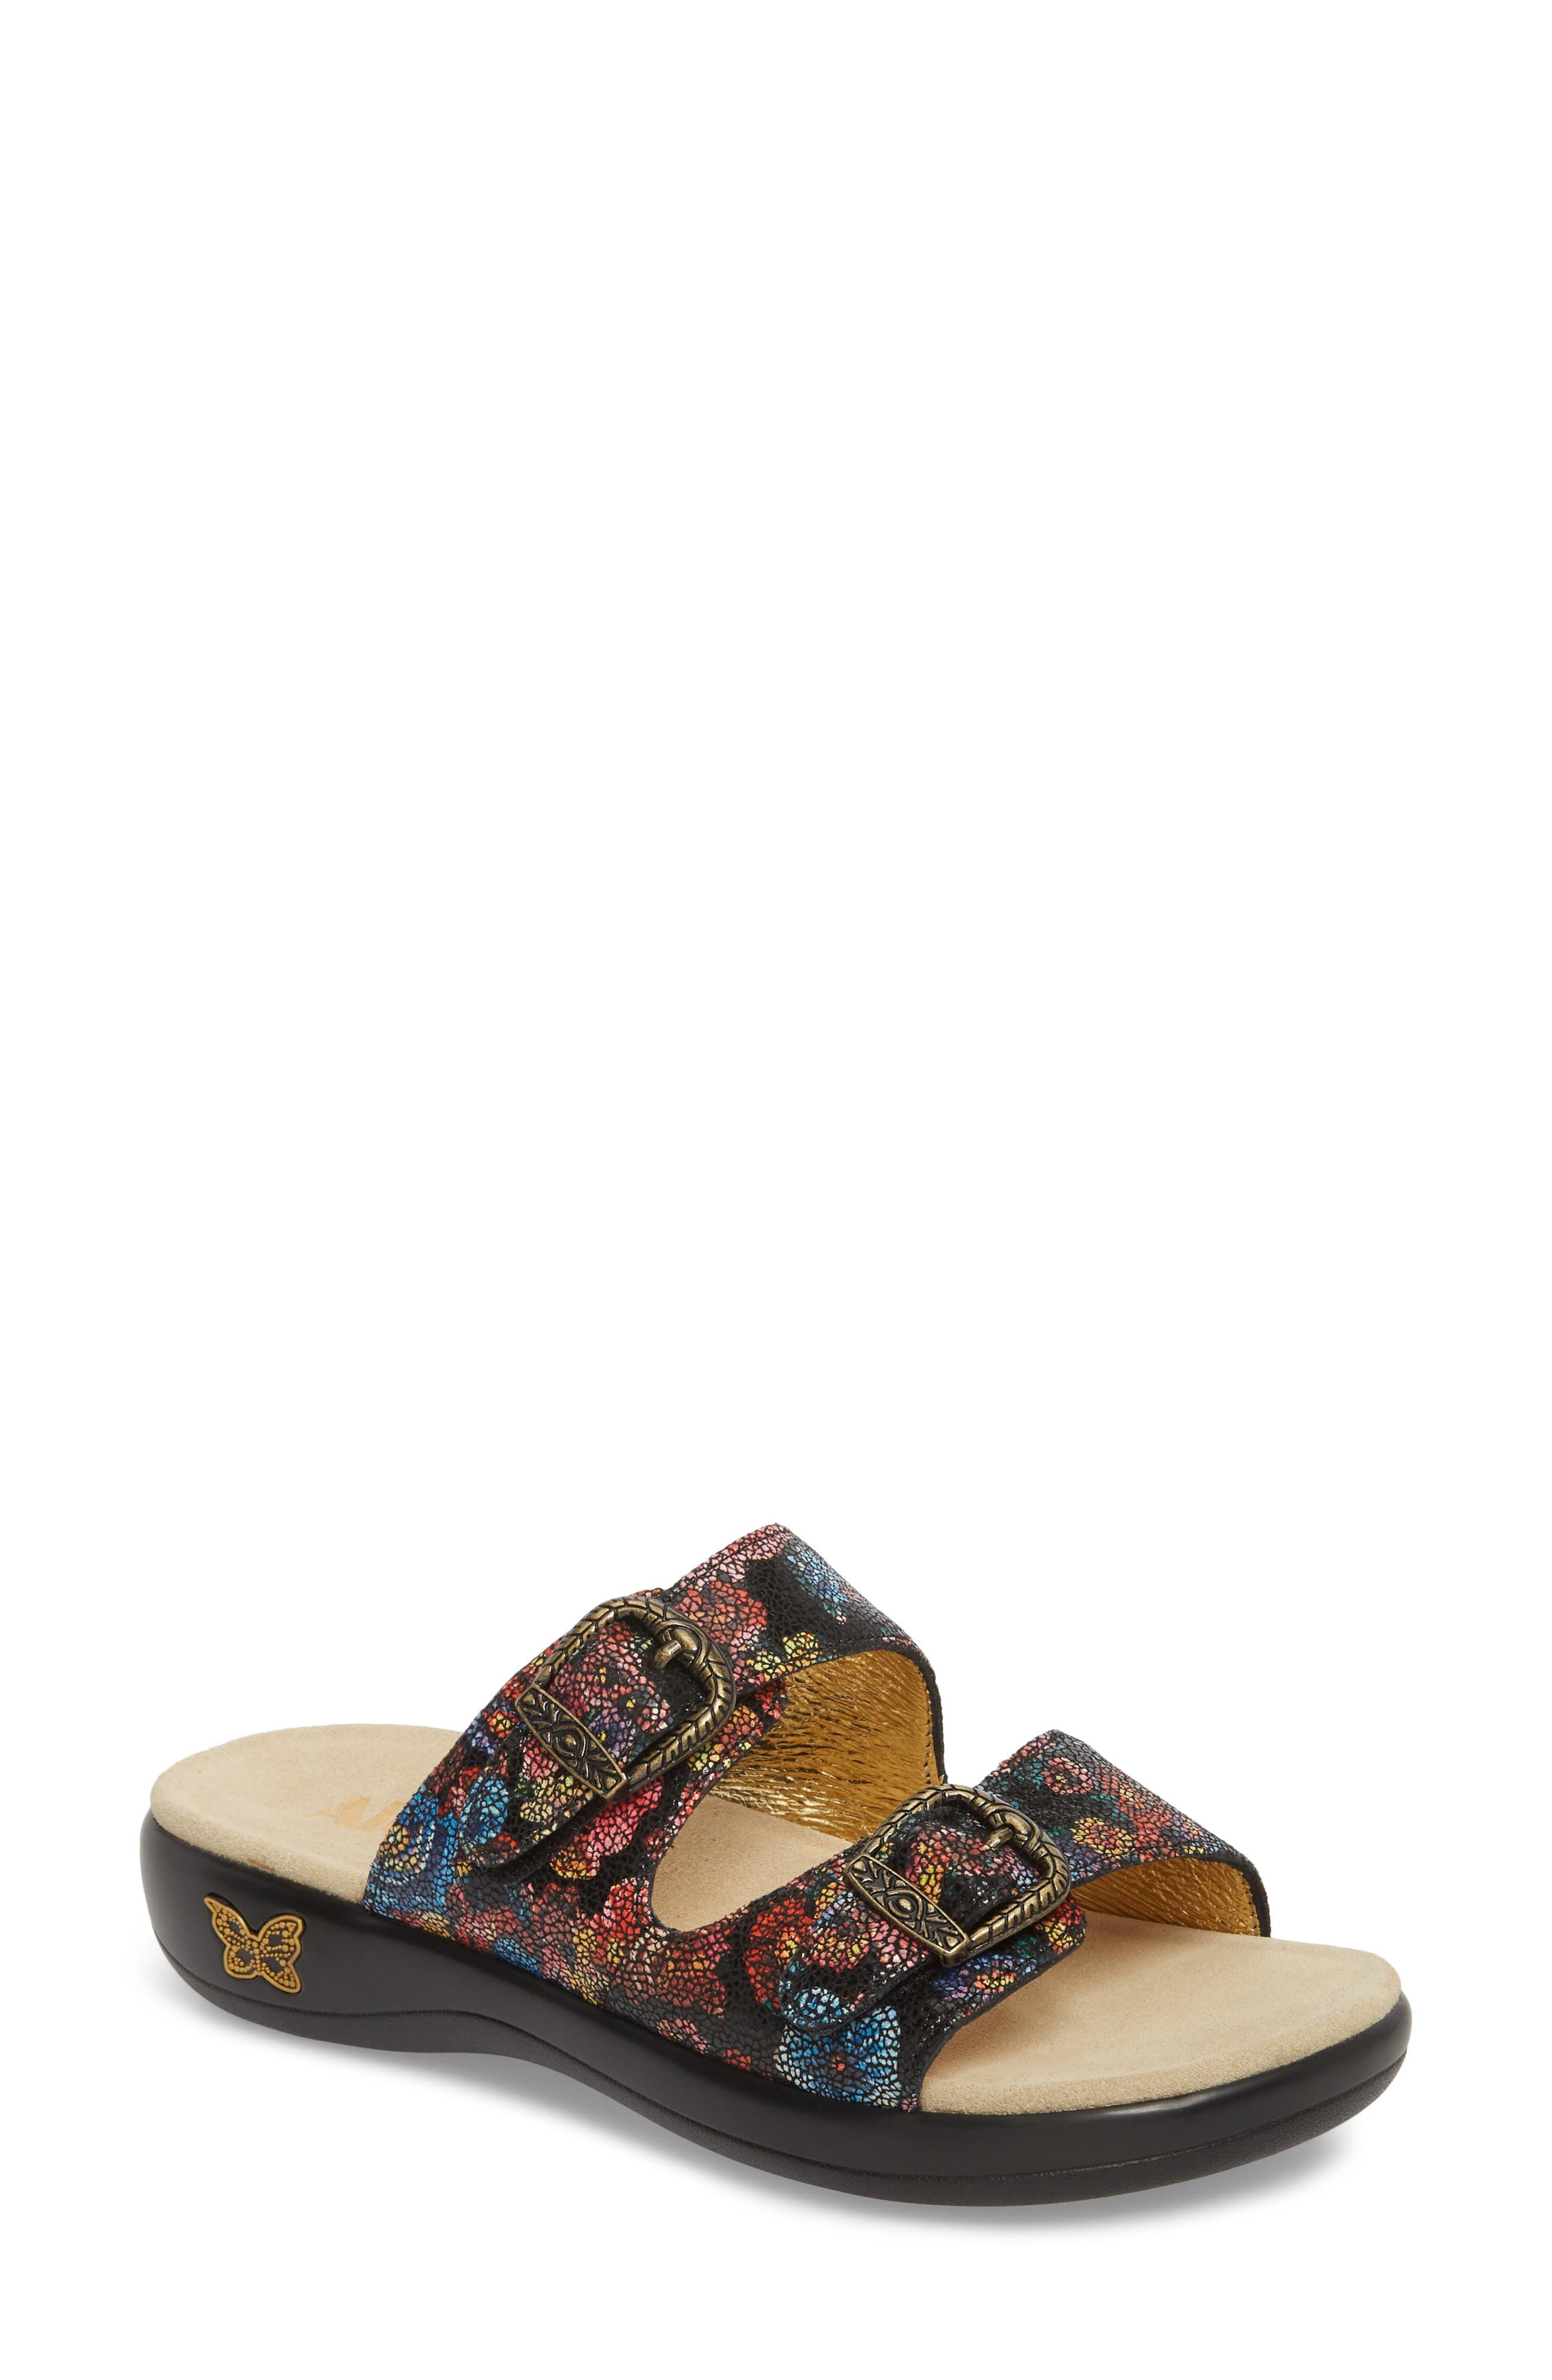 Jade Sandal,                         Main,                         color, Florensic Files Leather